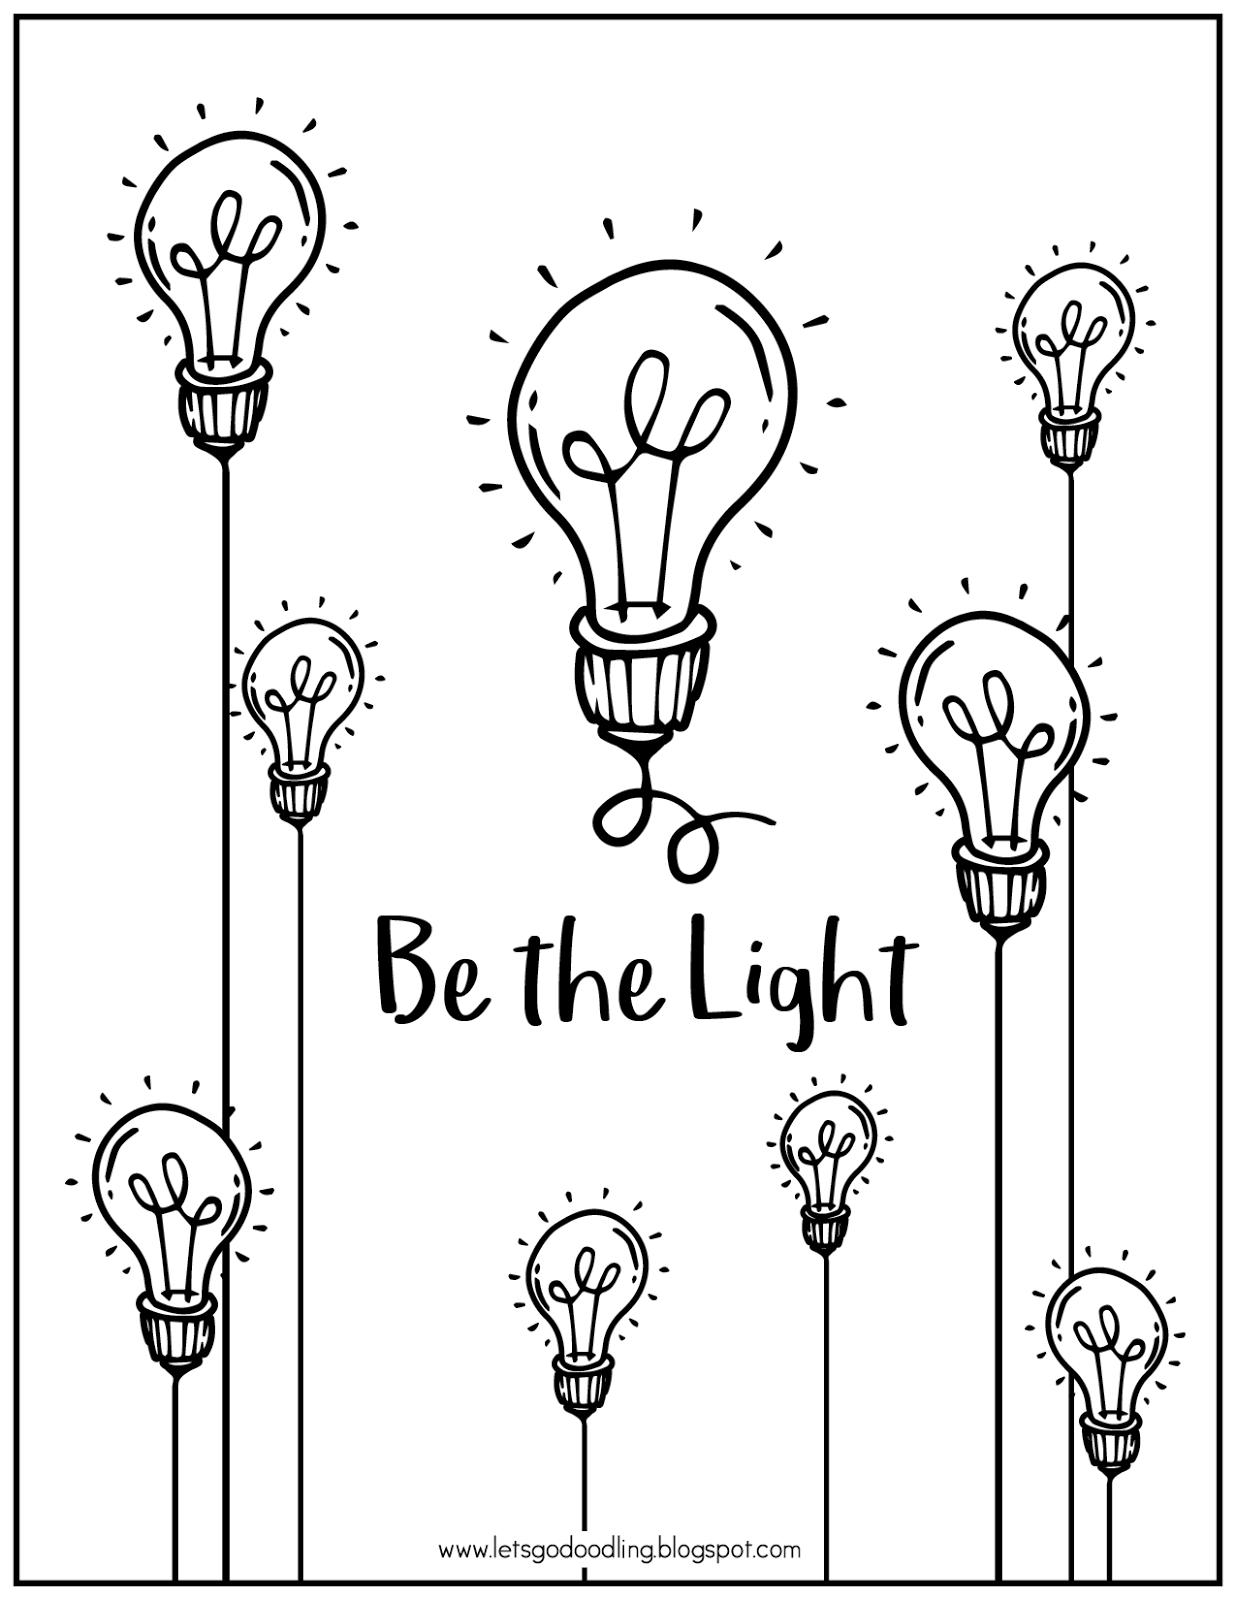 FREE Printable Coloring Page: Light Bulb